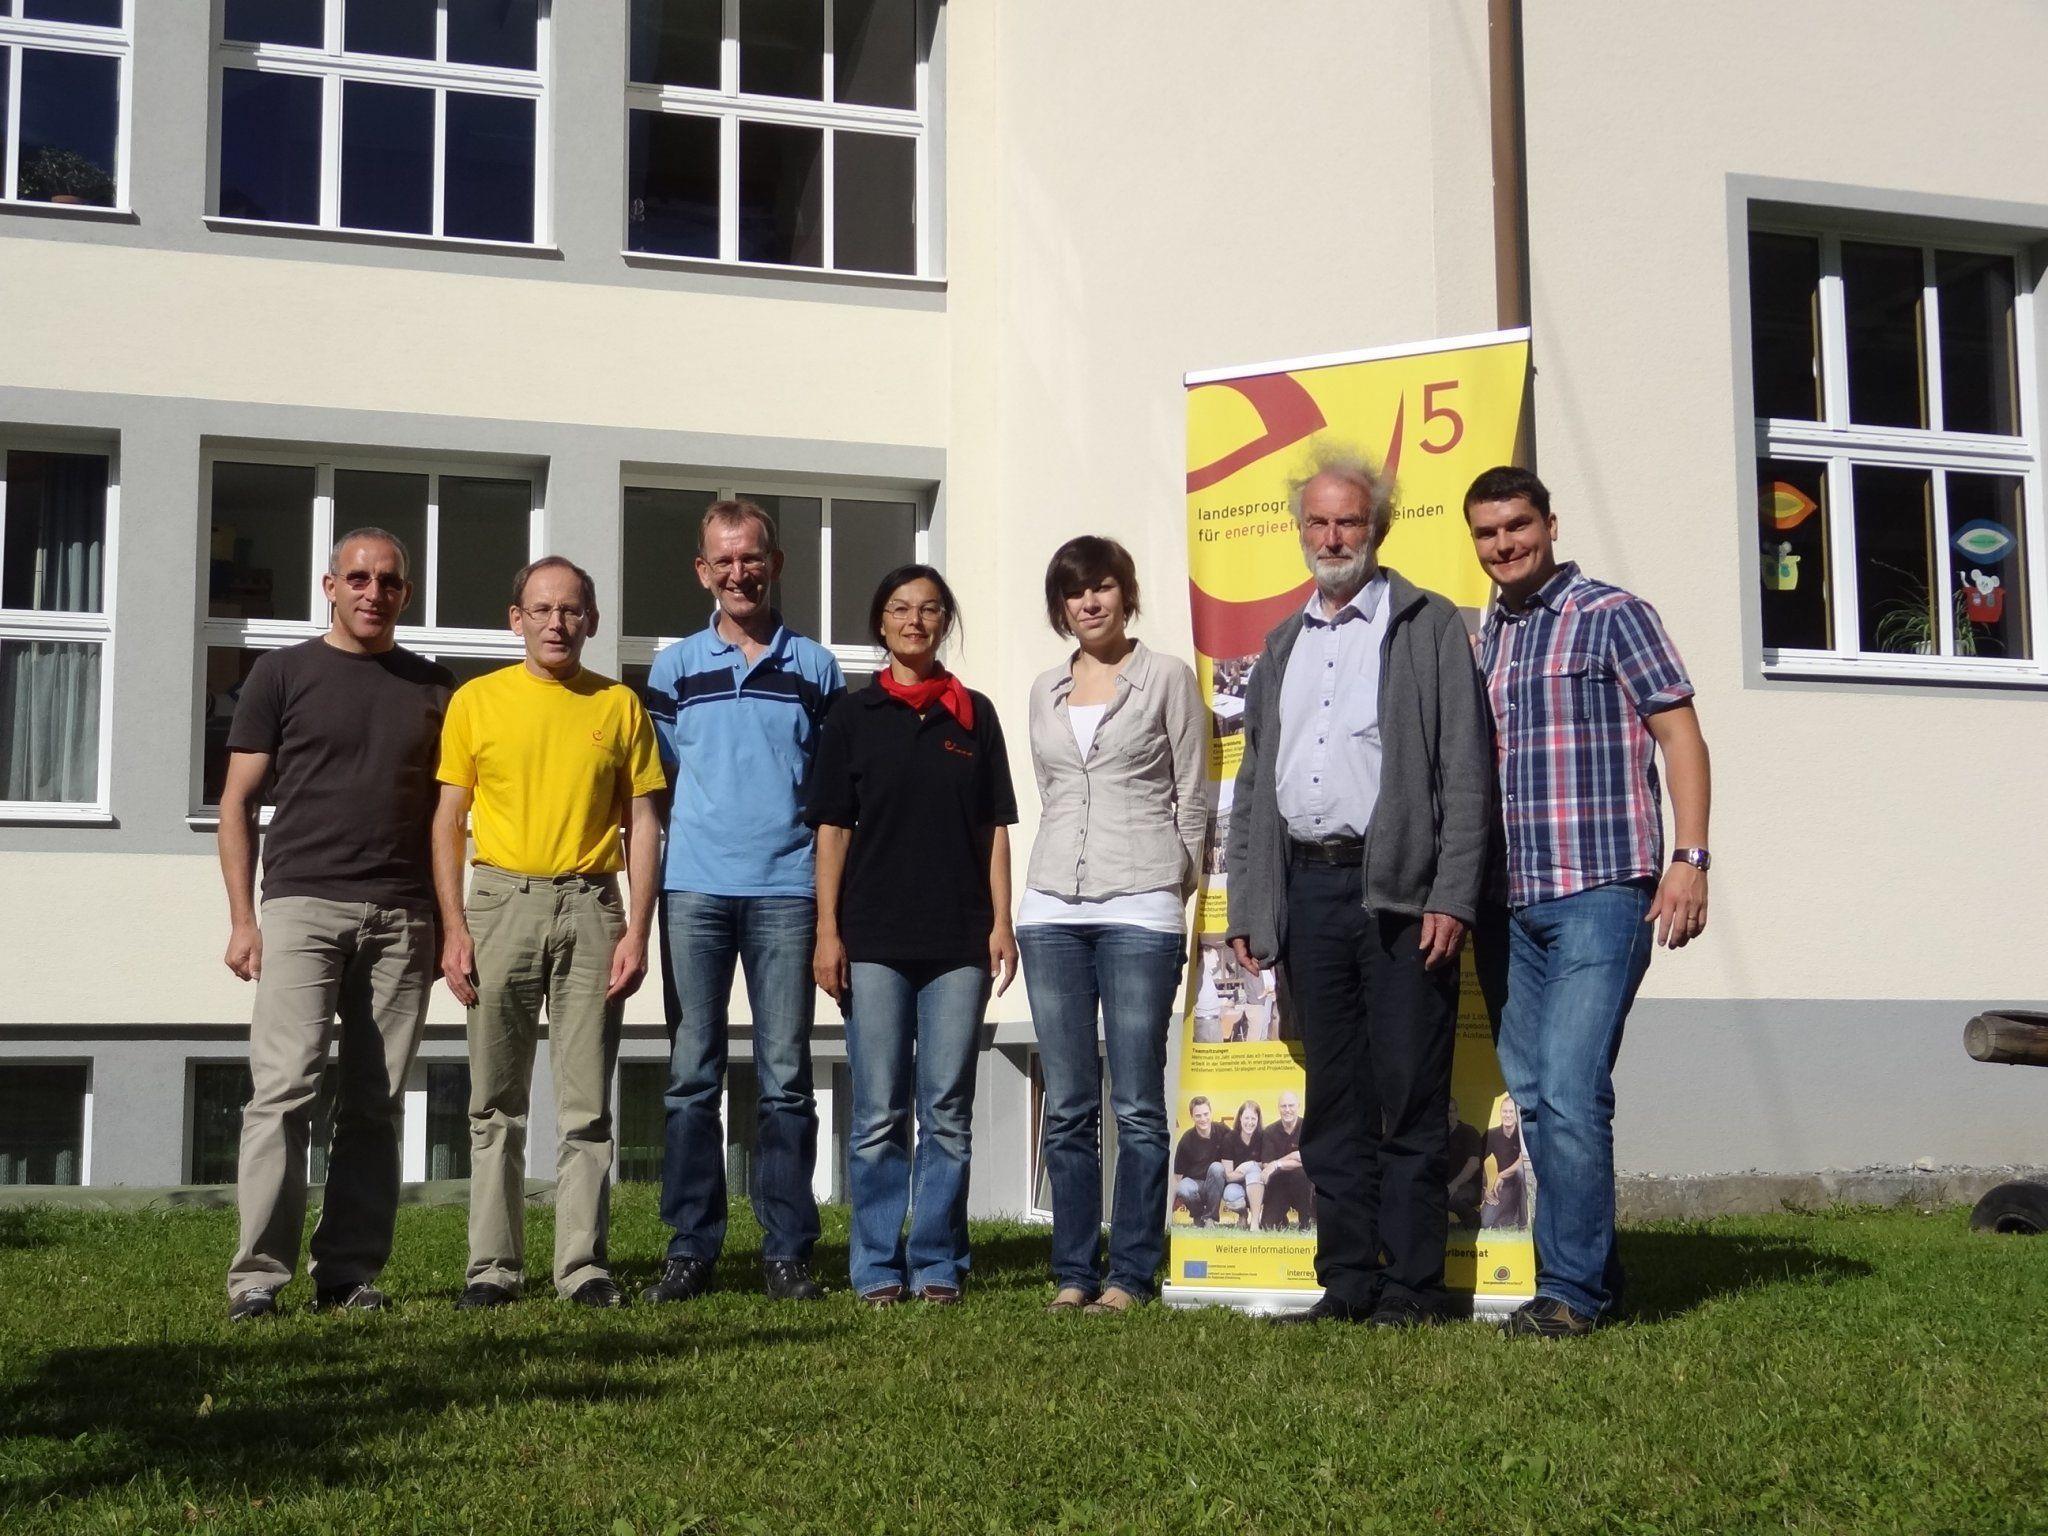 e5-Energieteam Gaschurn-Partenen